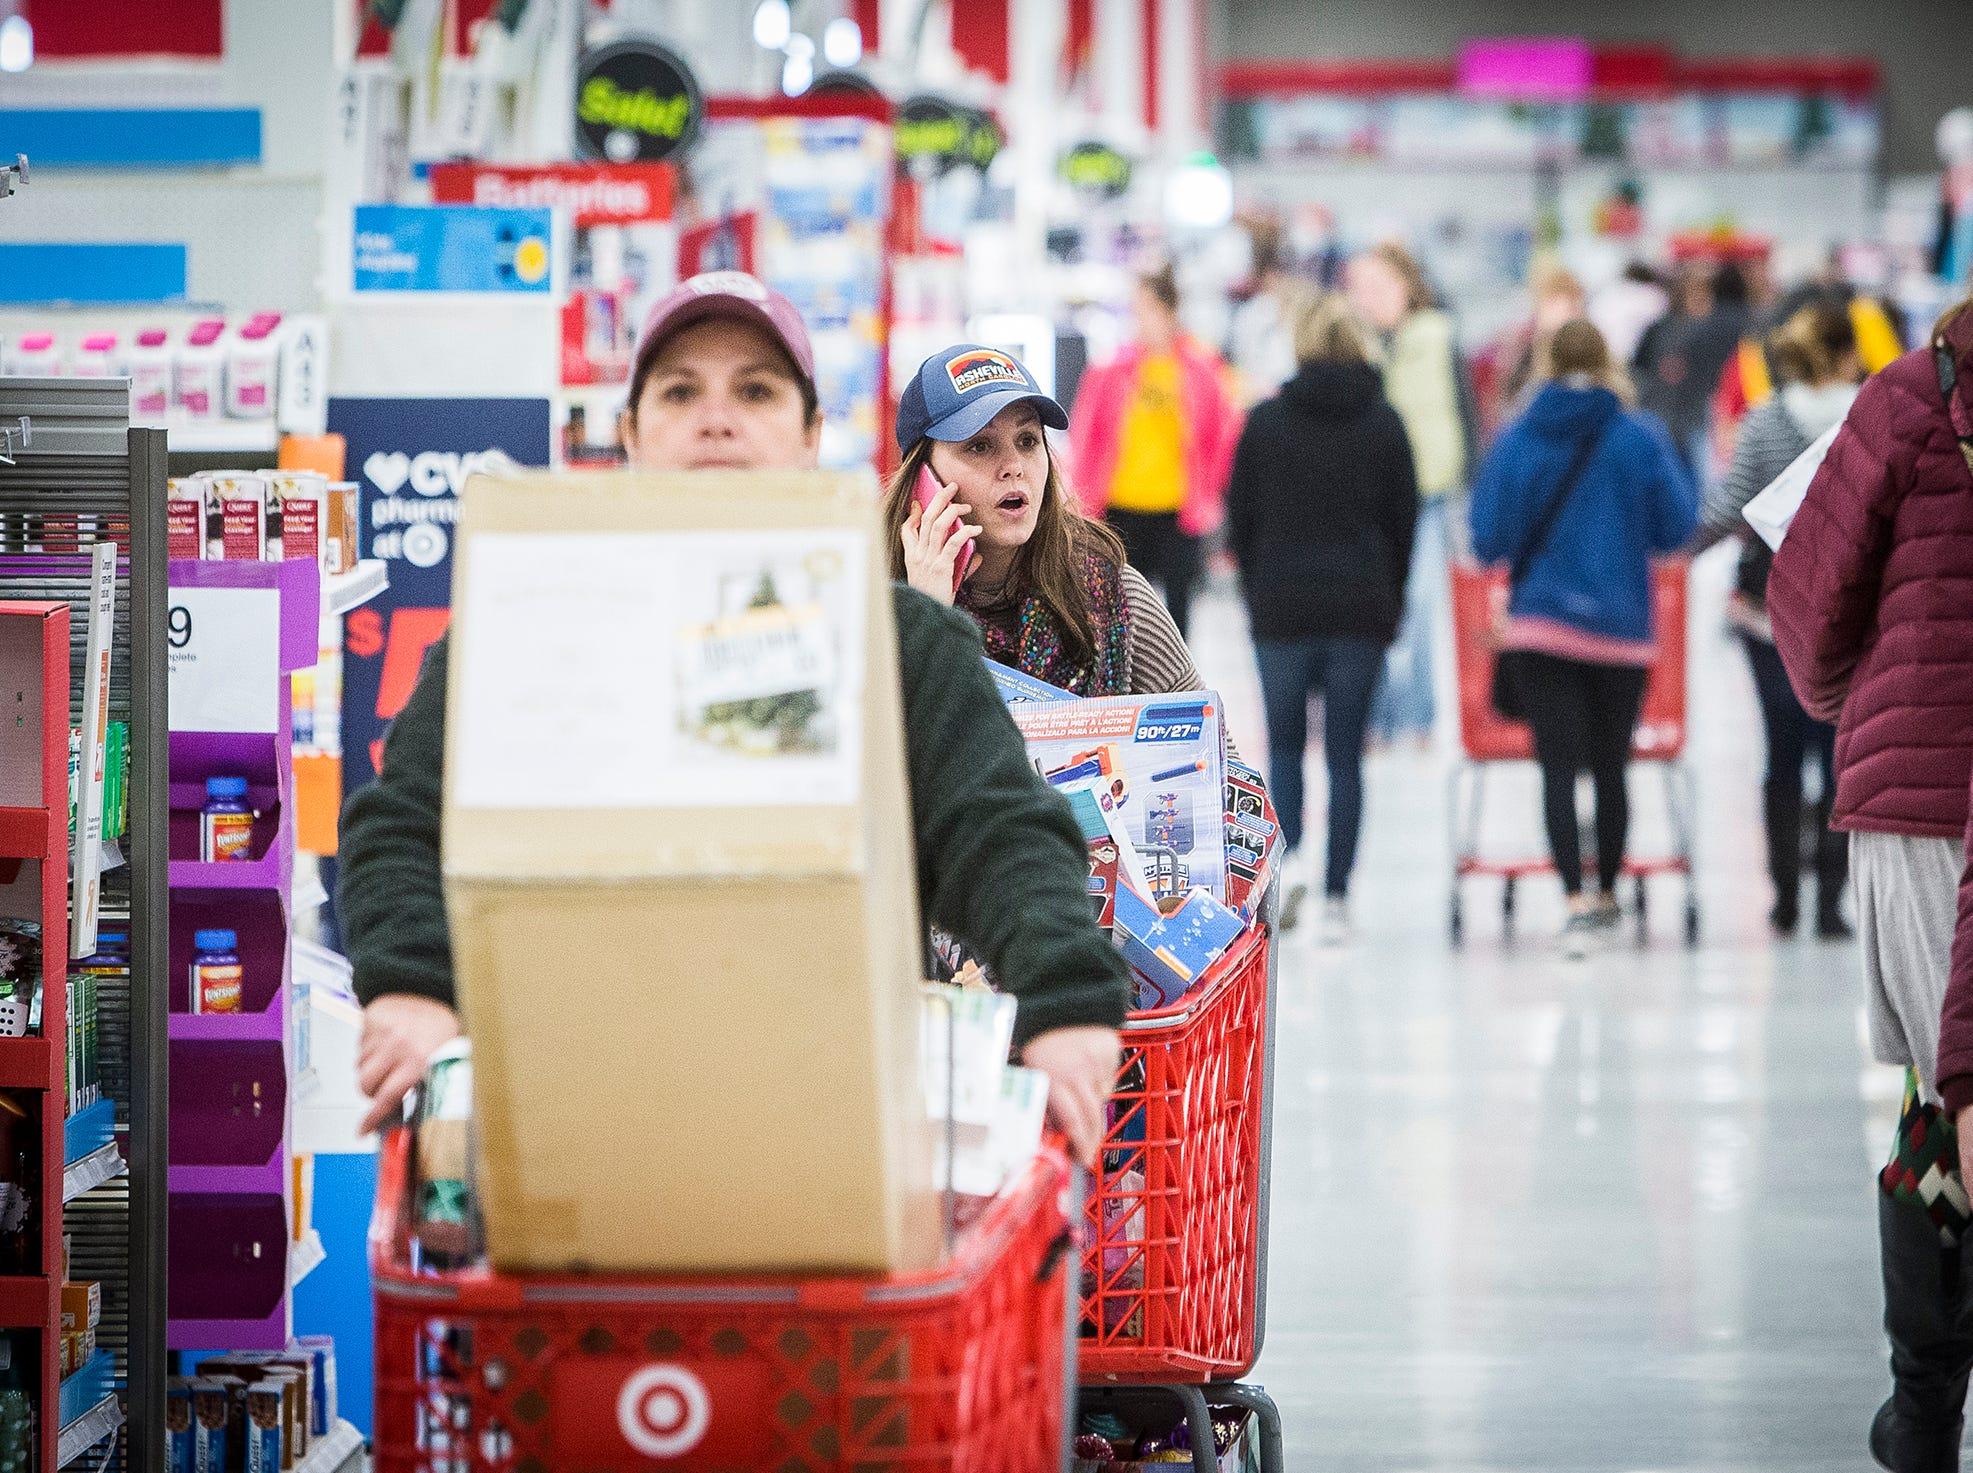 Shoppers take advantage of Black Friday deals at Target.